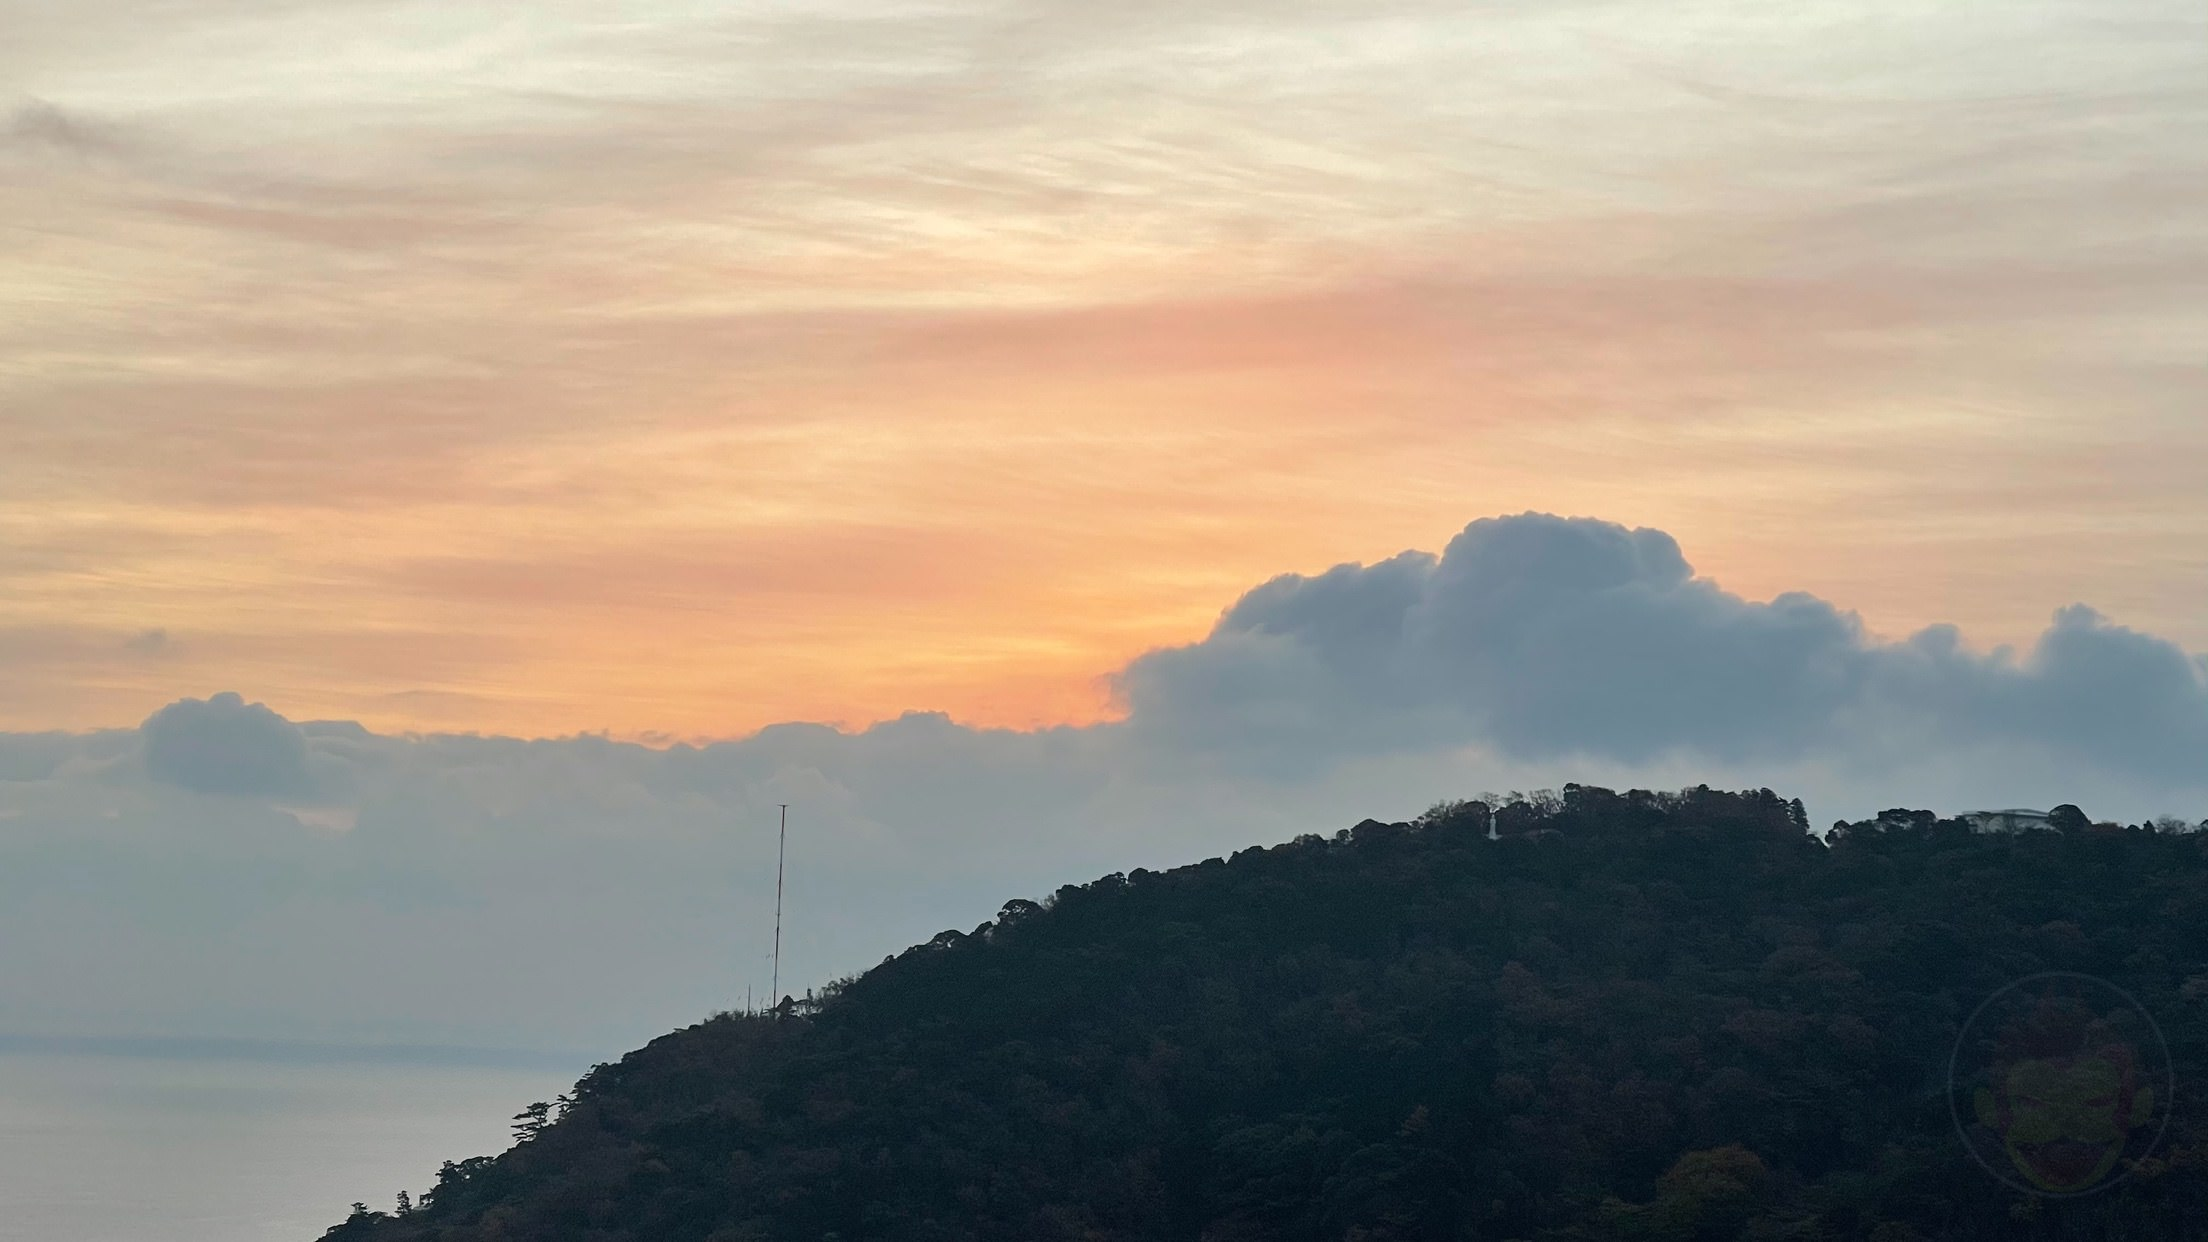 IPhone 12 Pro max Photo Sample of dawn 01